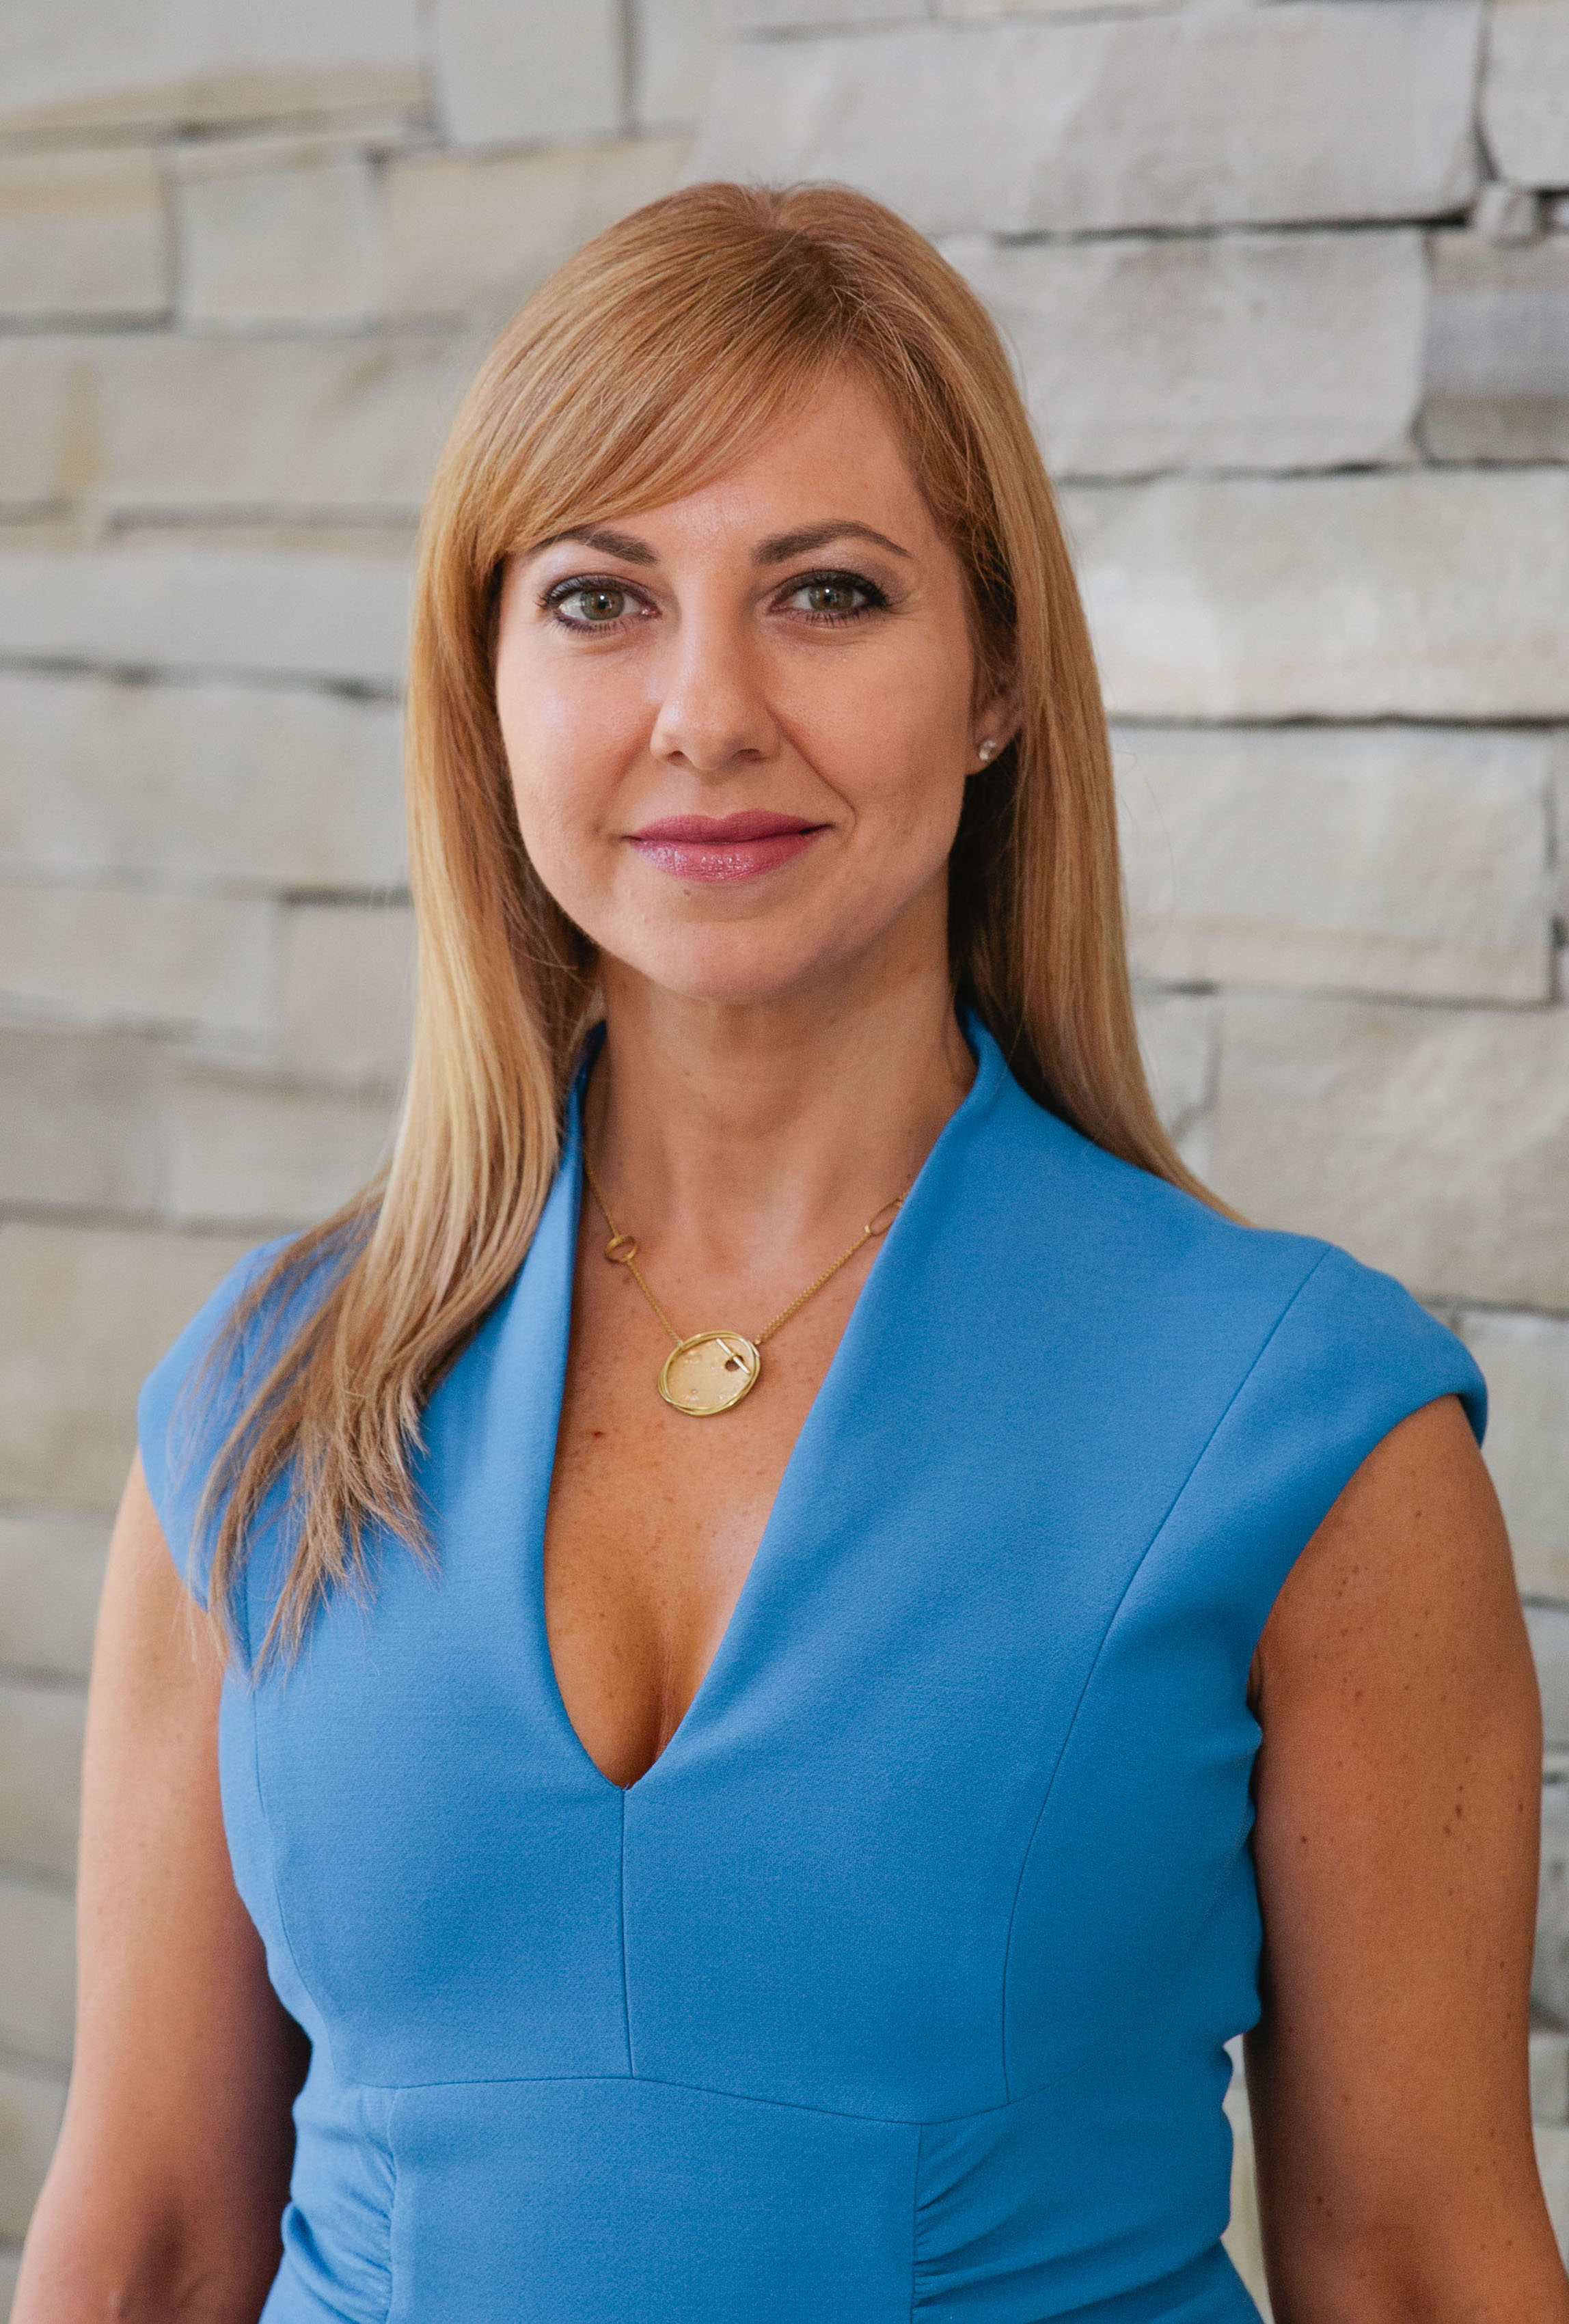 Georgia Balafas - Associate Brokergeorgia.balafas@compass.comM: 617.283.1570